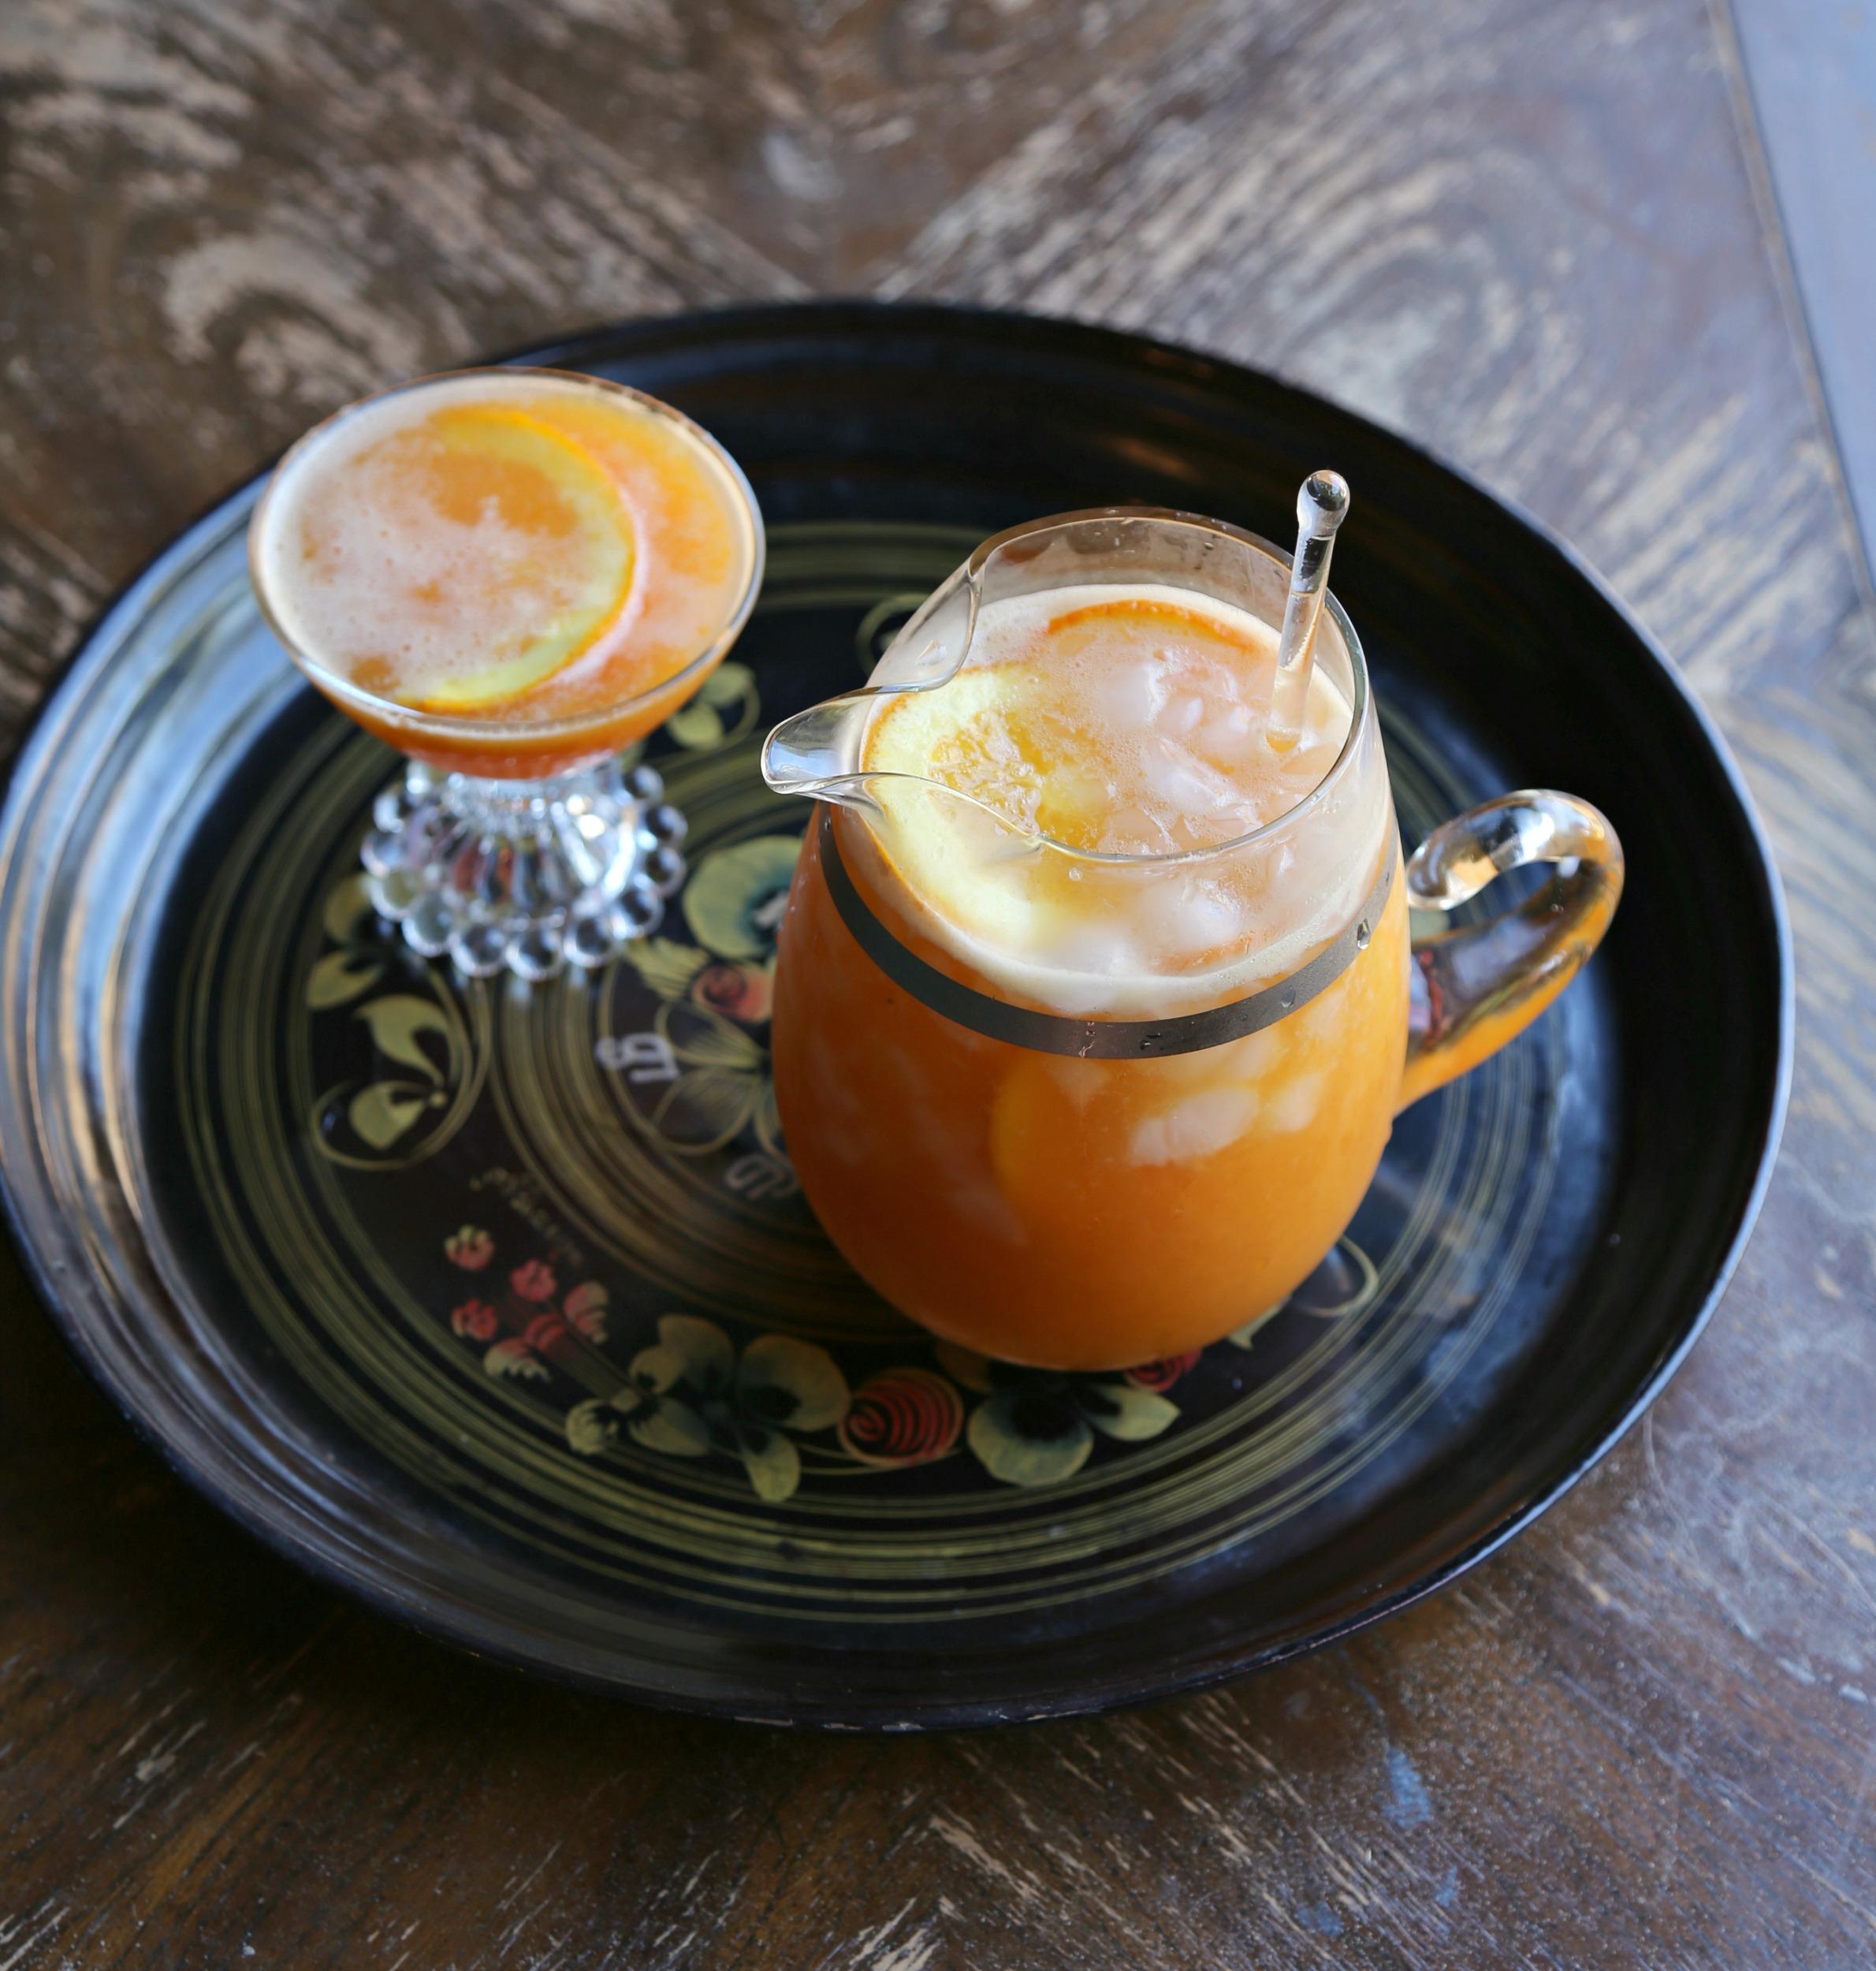 papaya-rum-punch-cocktail-vianneyrodriguez-sweetlifebake